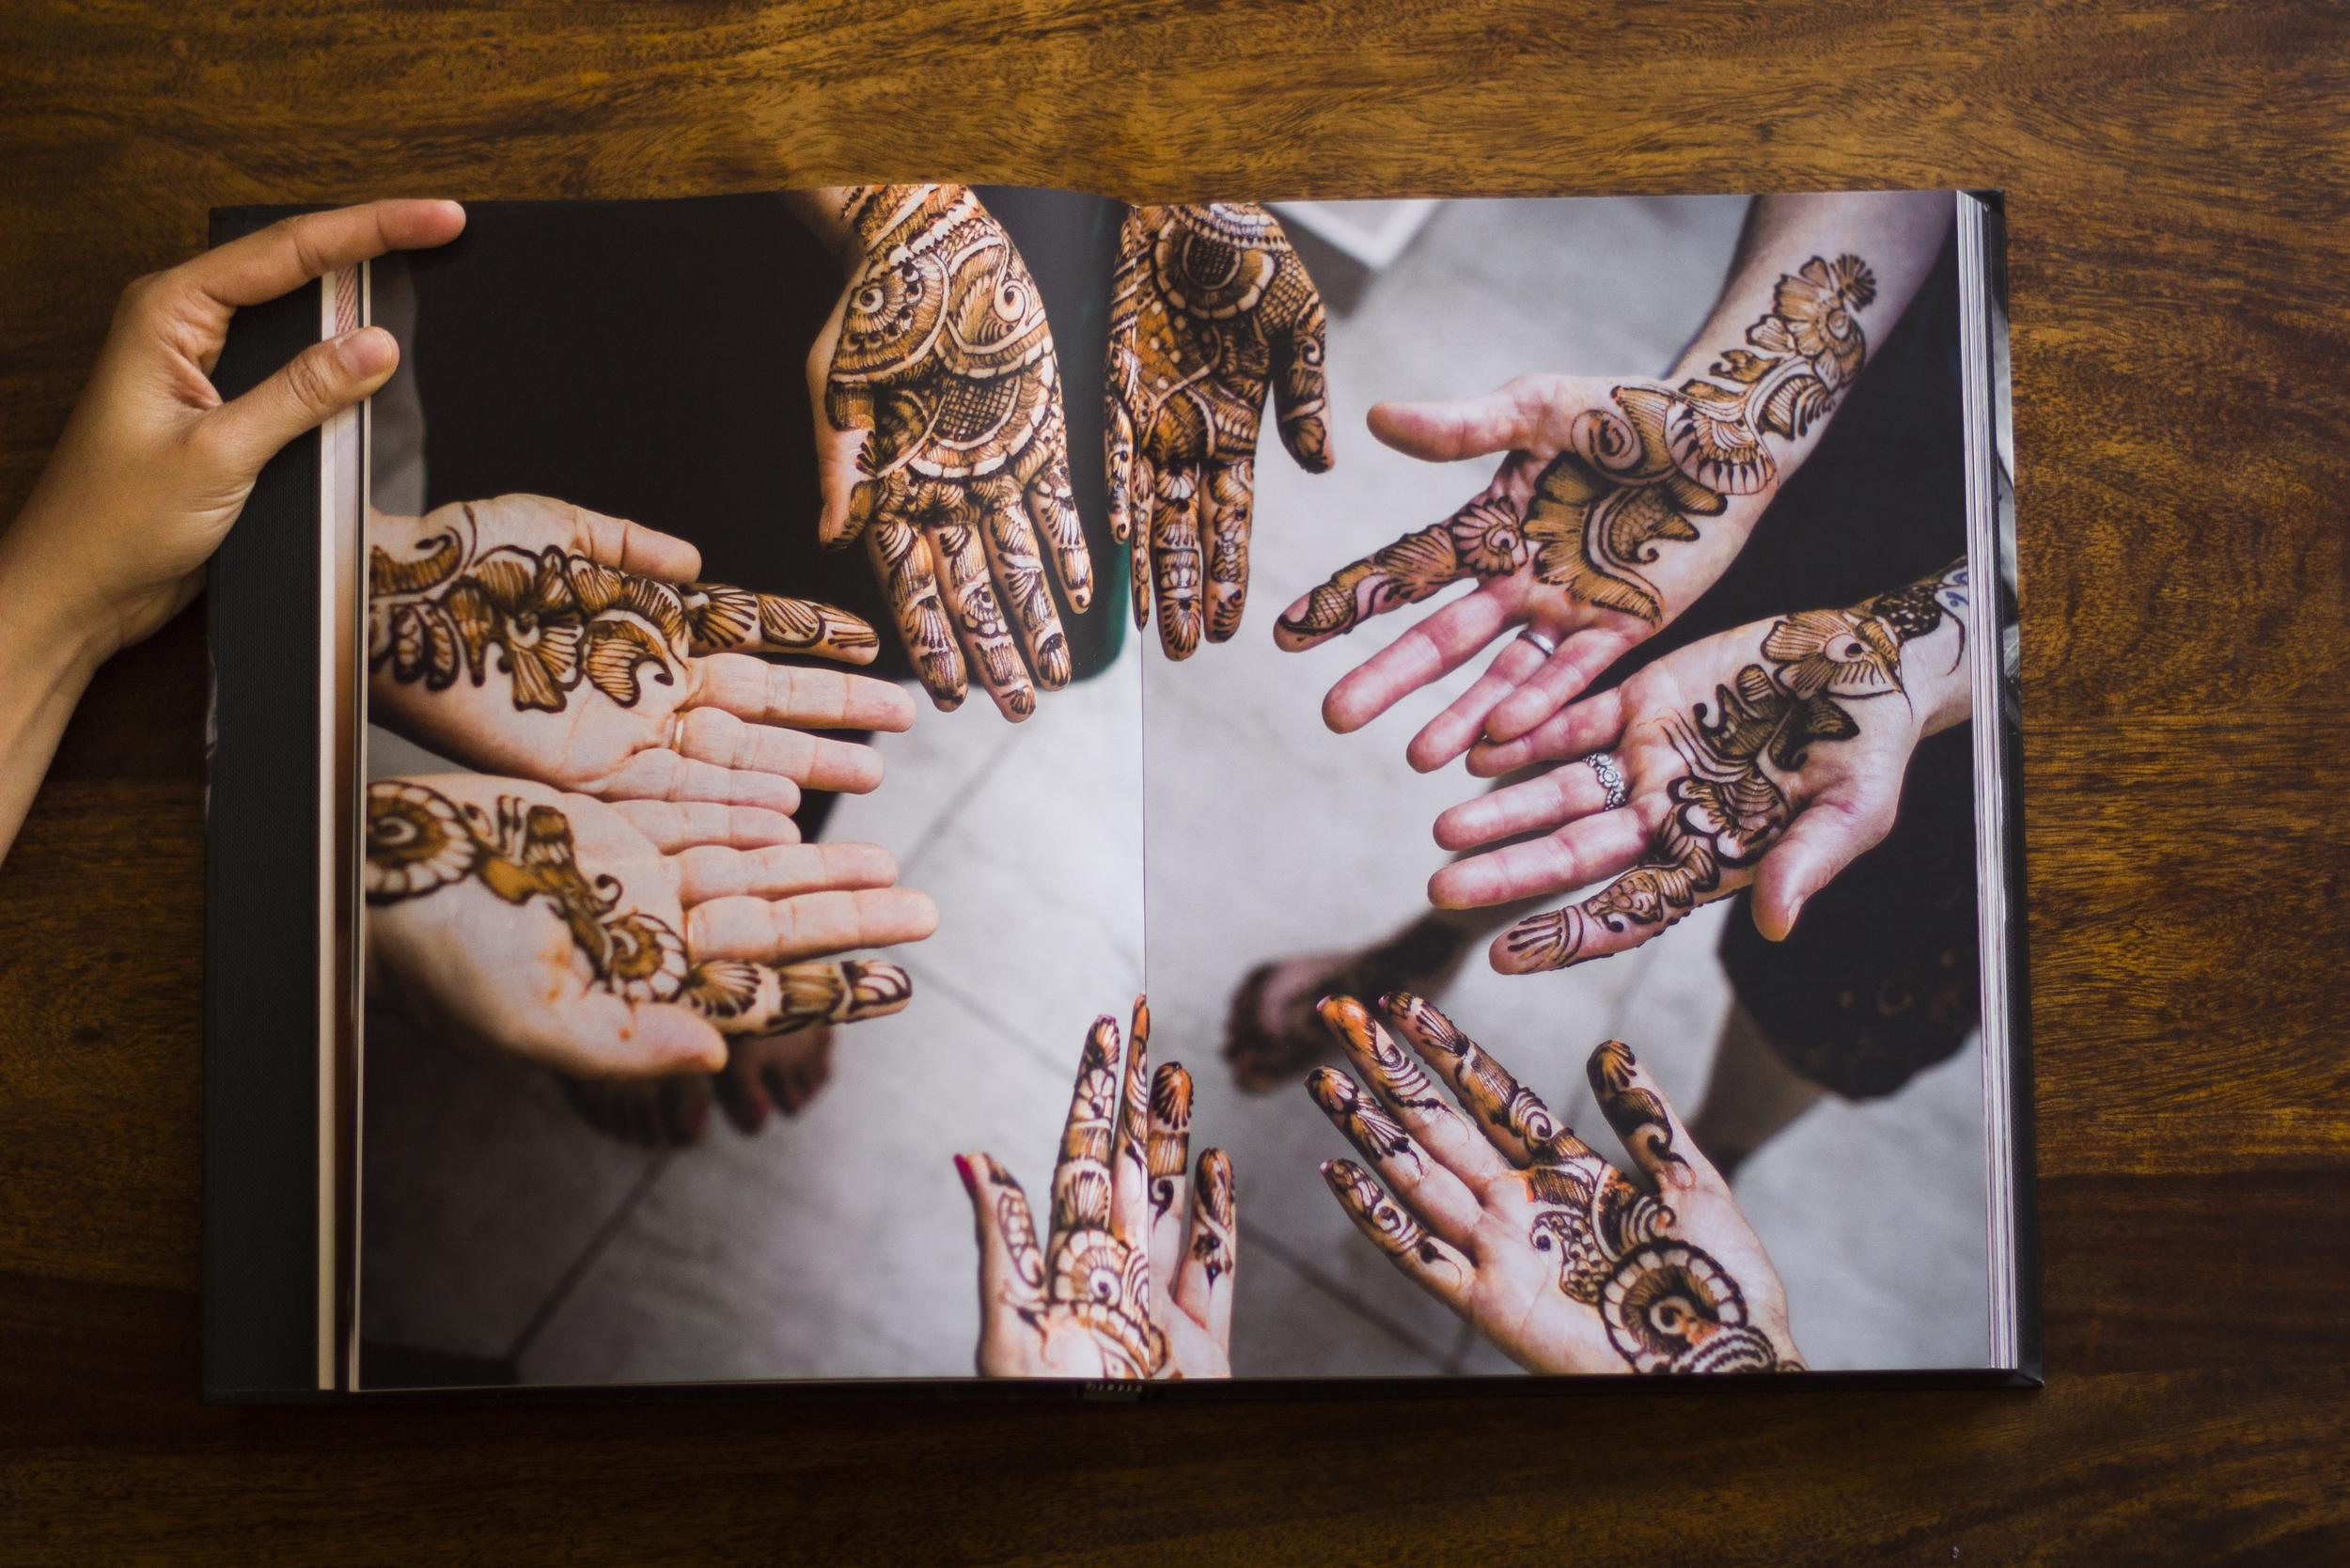 jude_lazaro_weddings_bangalore_india_Photo Book_NRI_Hindu_Muslim_Christian_Candid__3.jpg